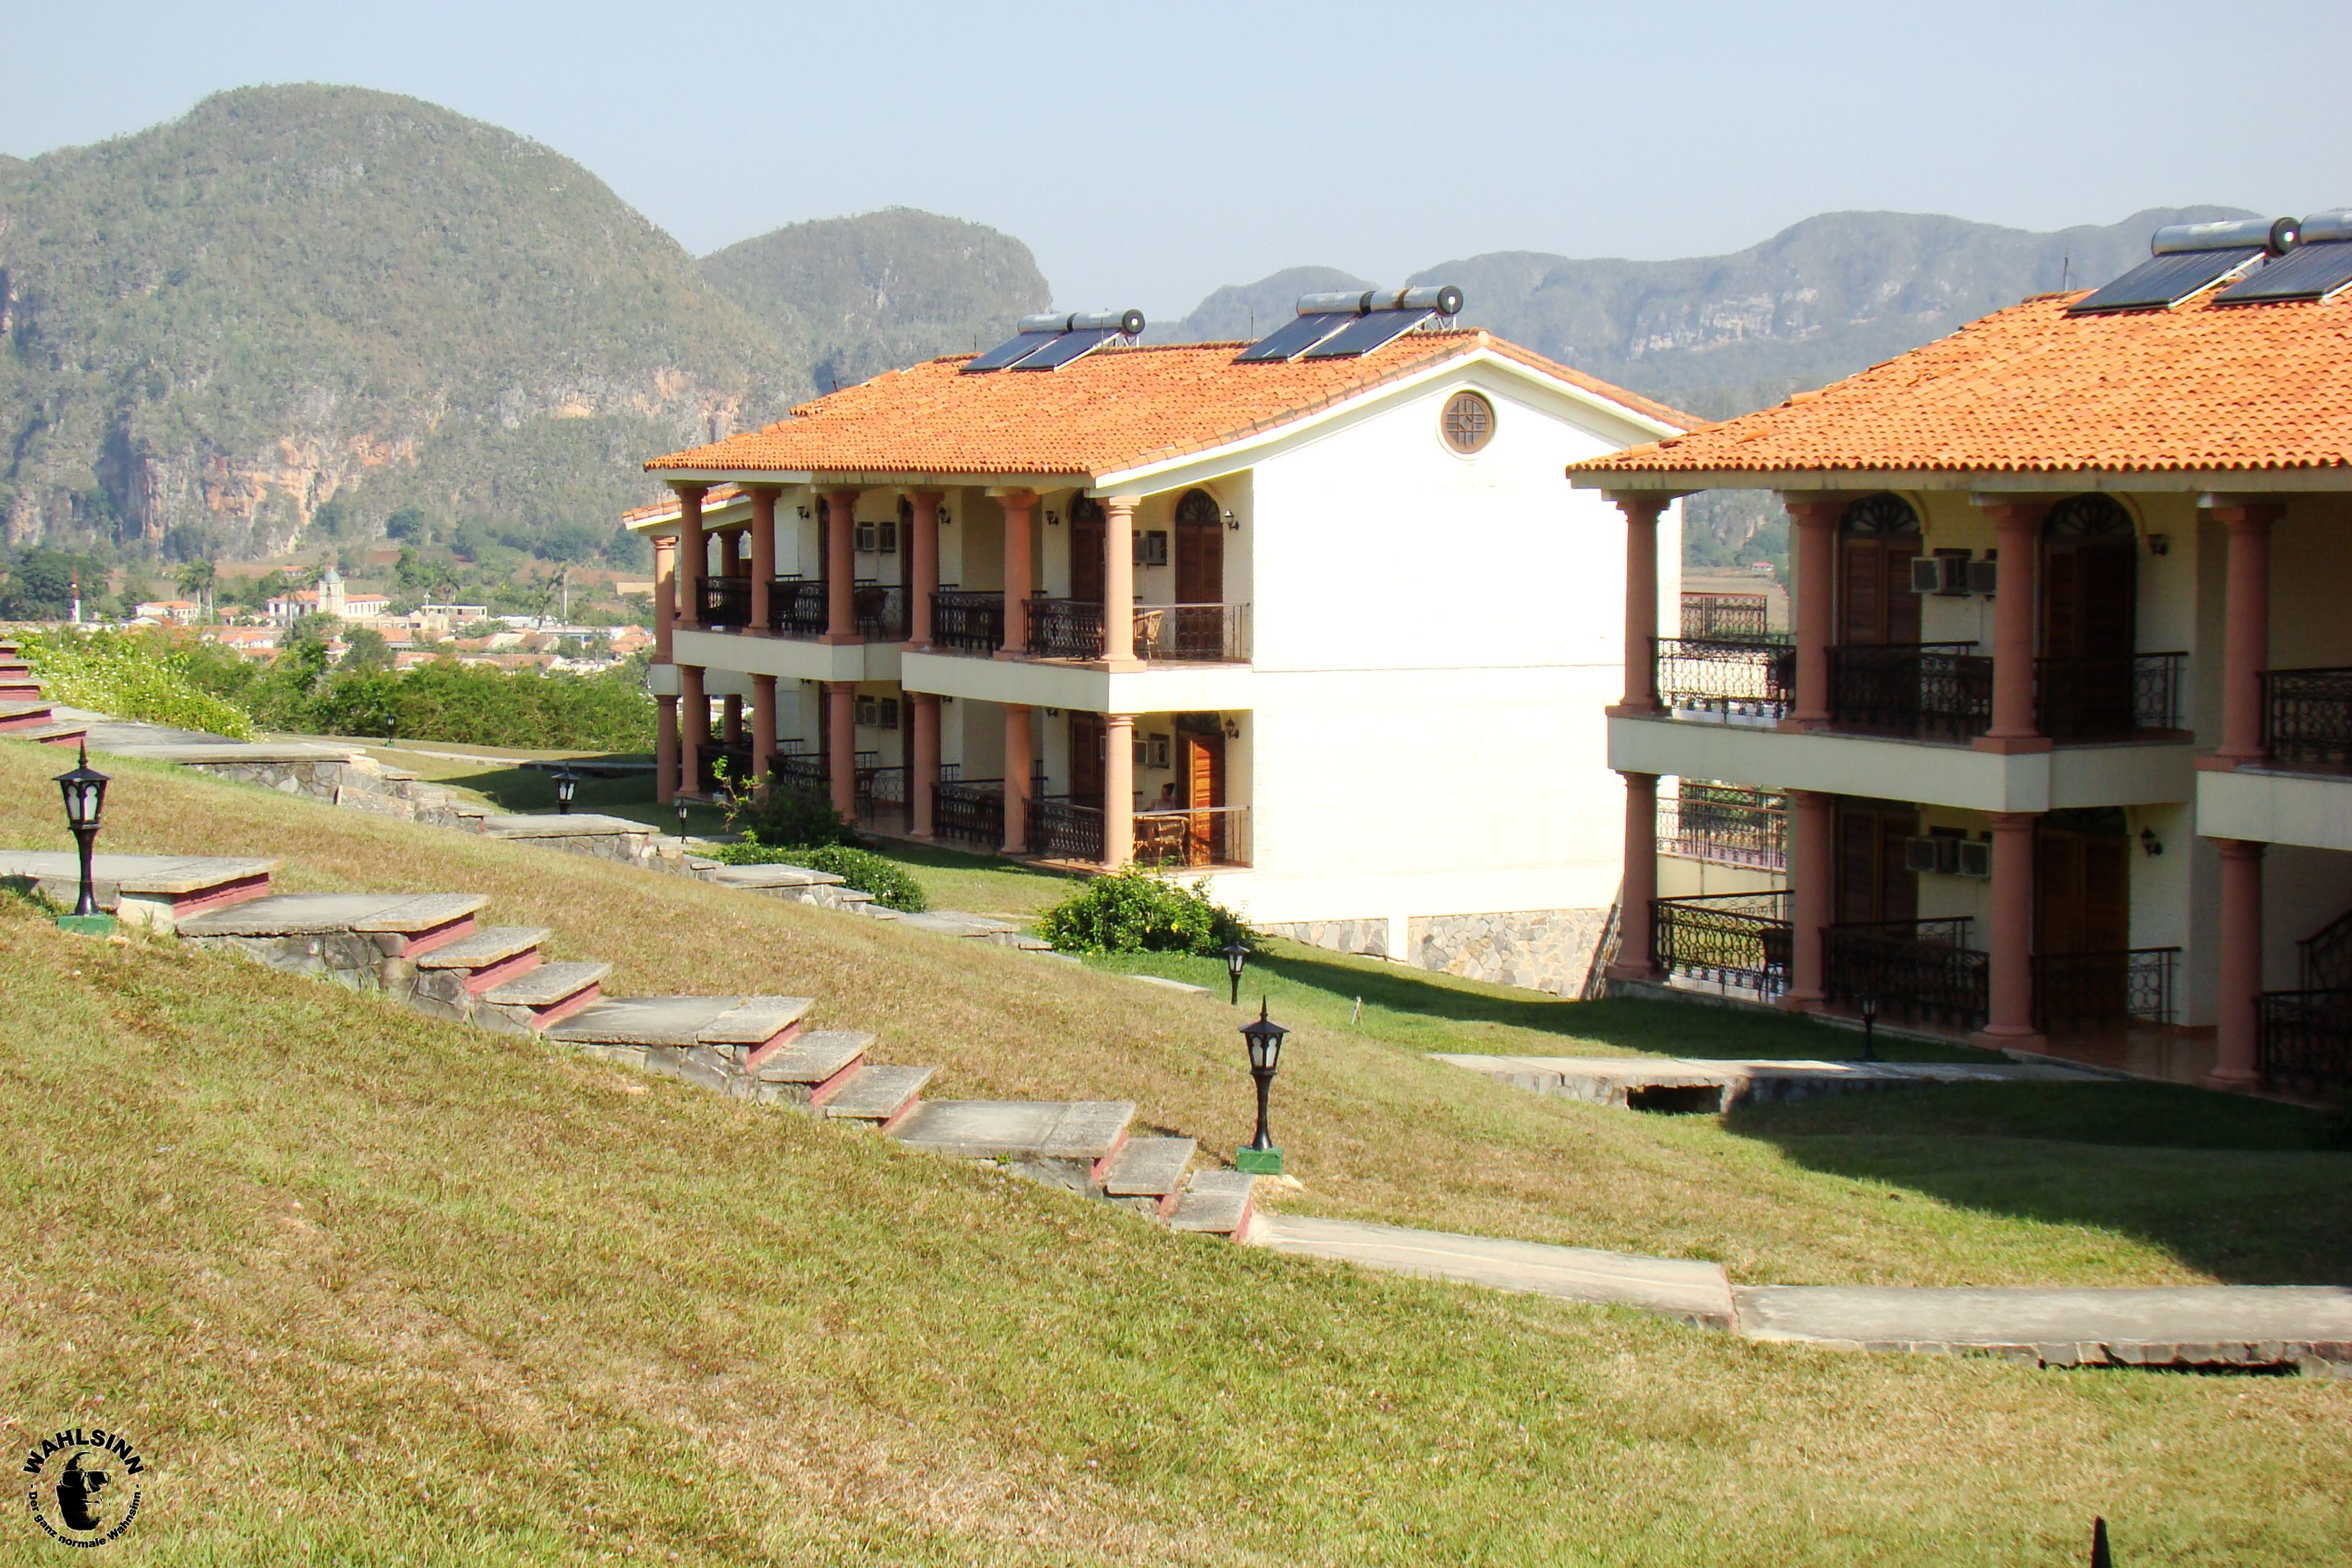 Hotelzimmer - Hotel La Ermita // Vinales (Kuba)